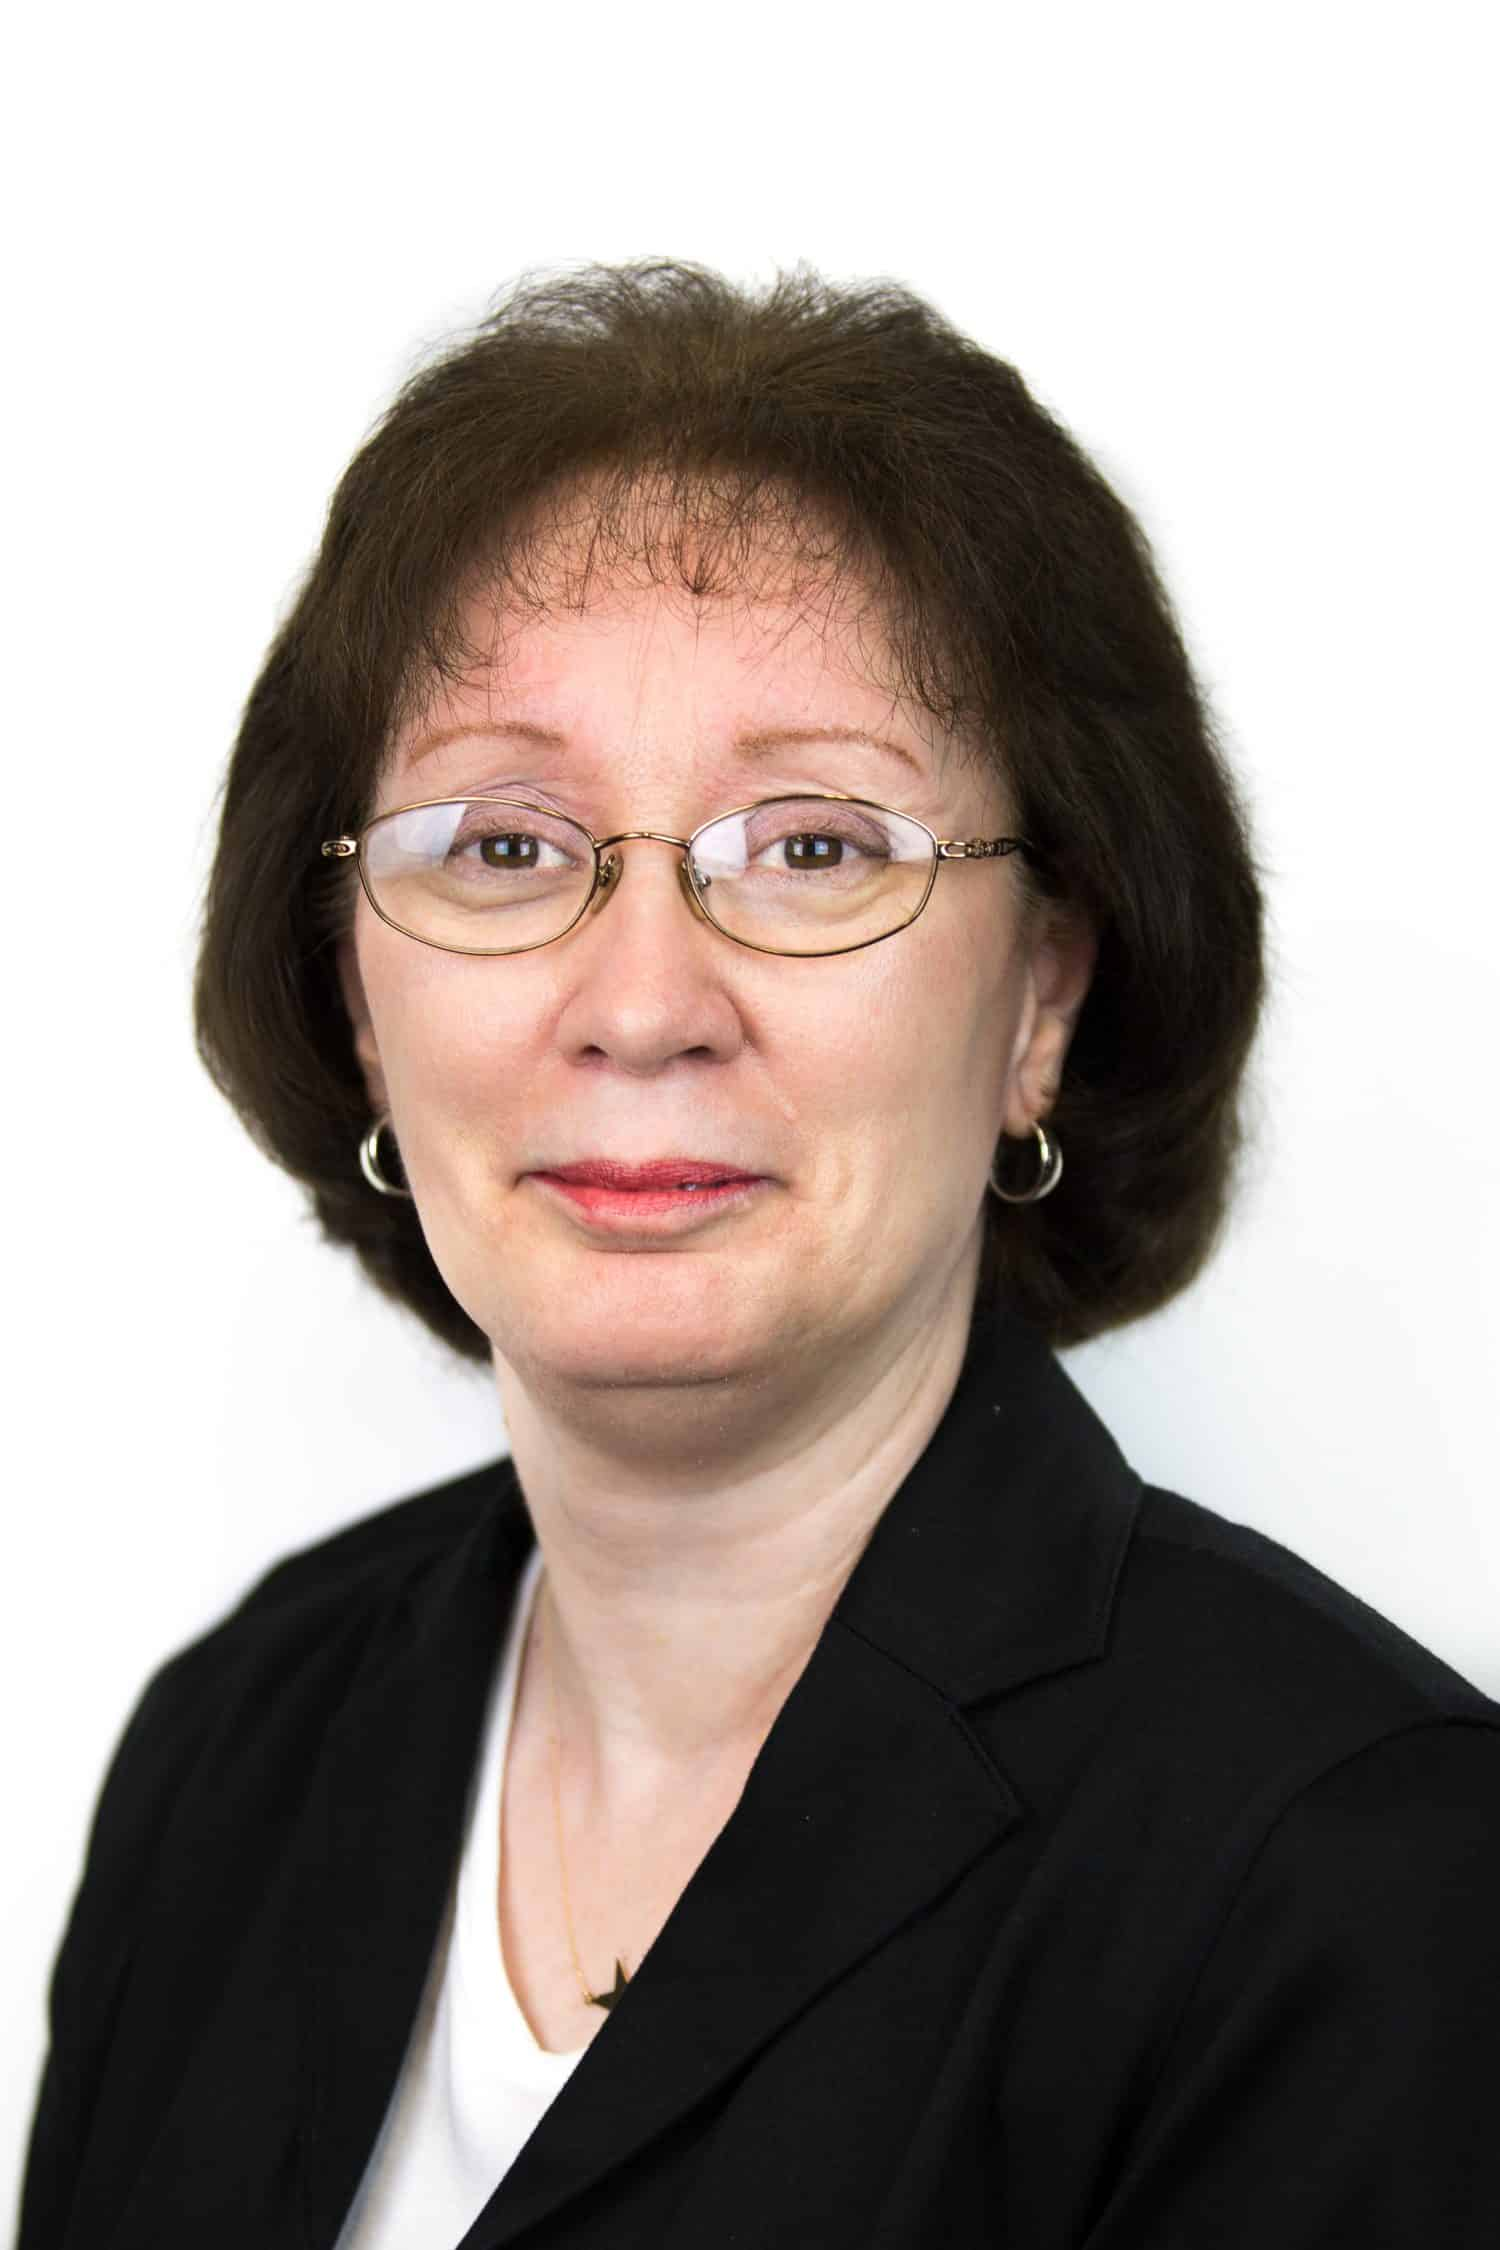 Claudia Tagliaferri – Barhite and Holzinger